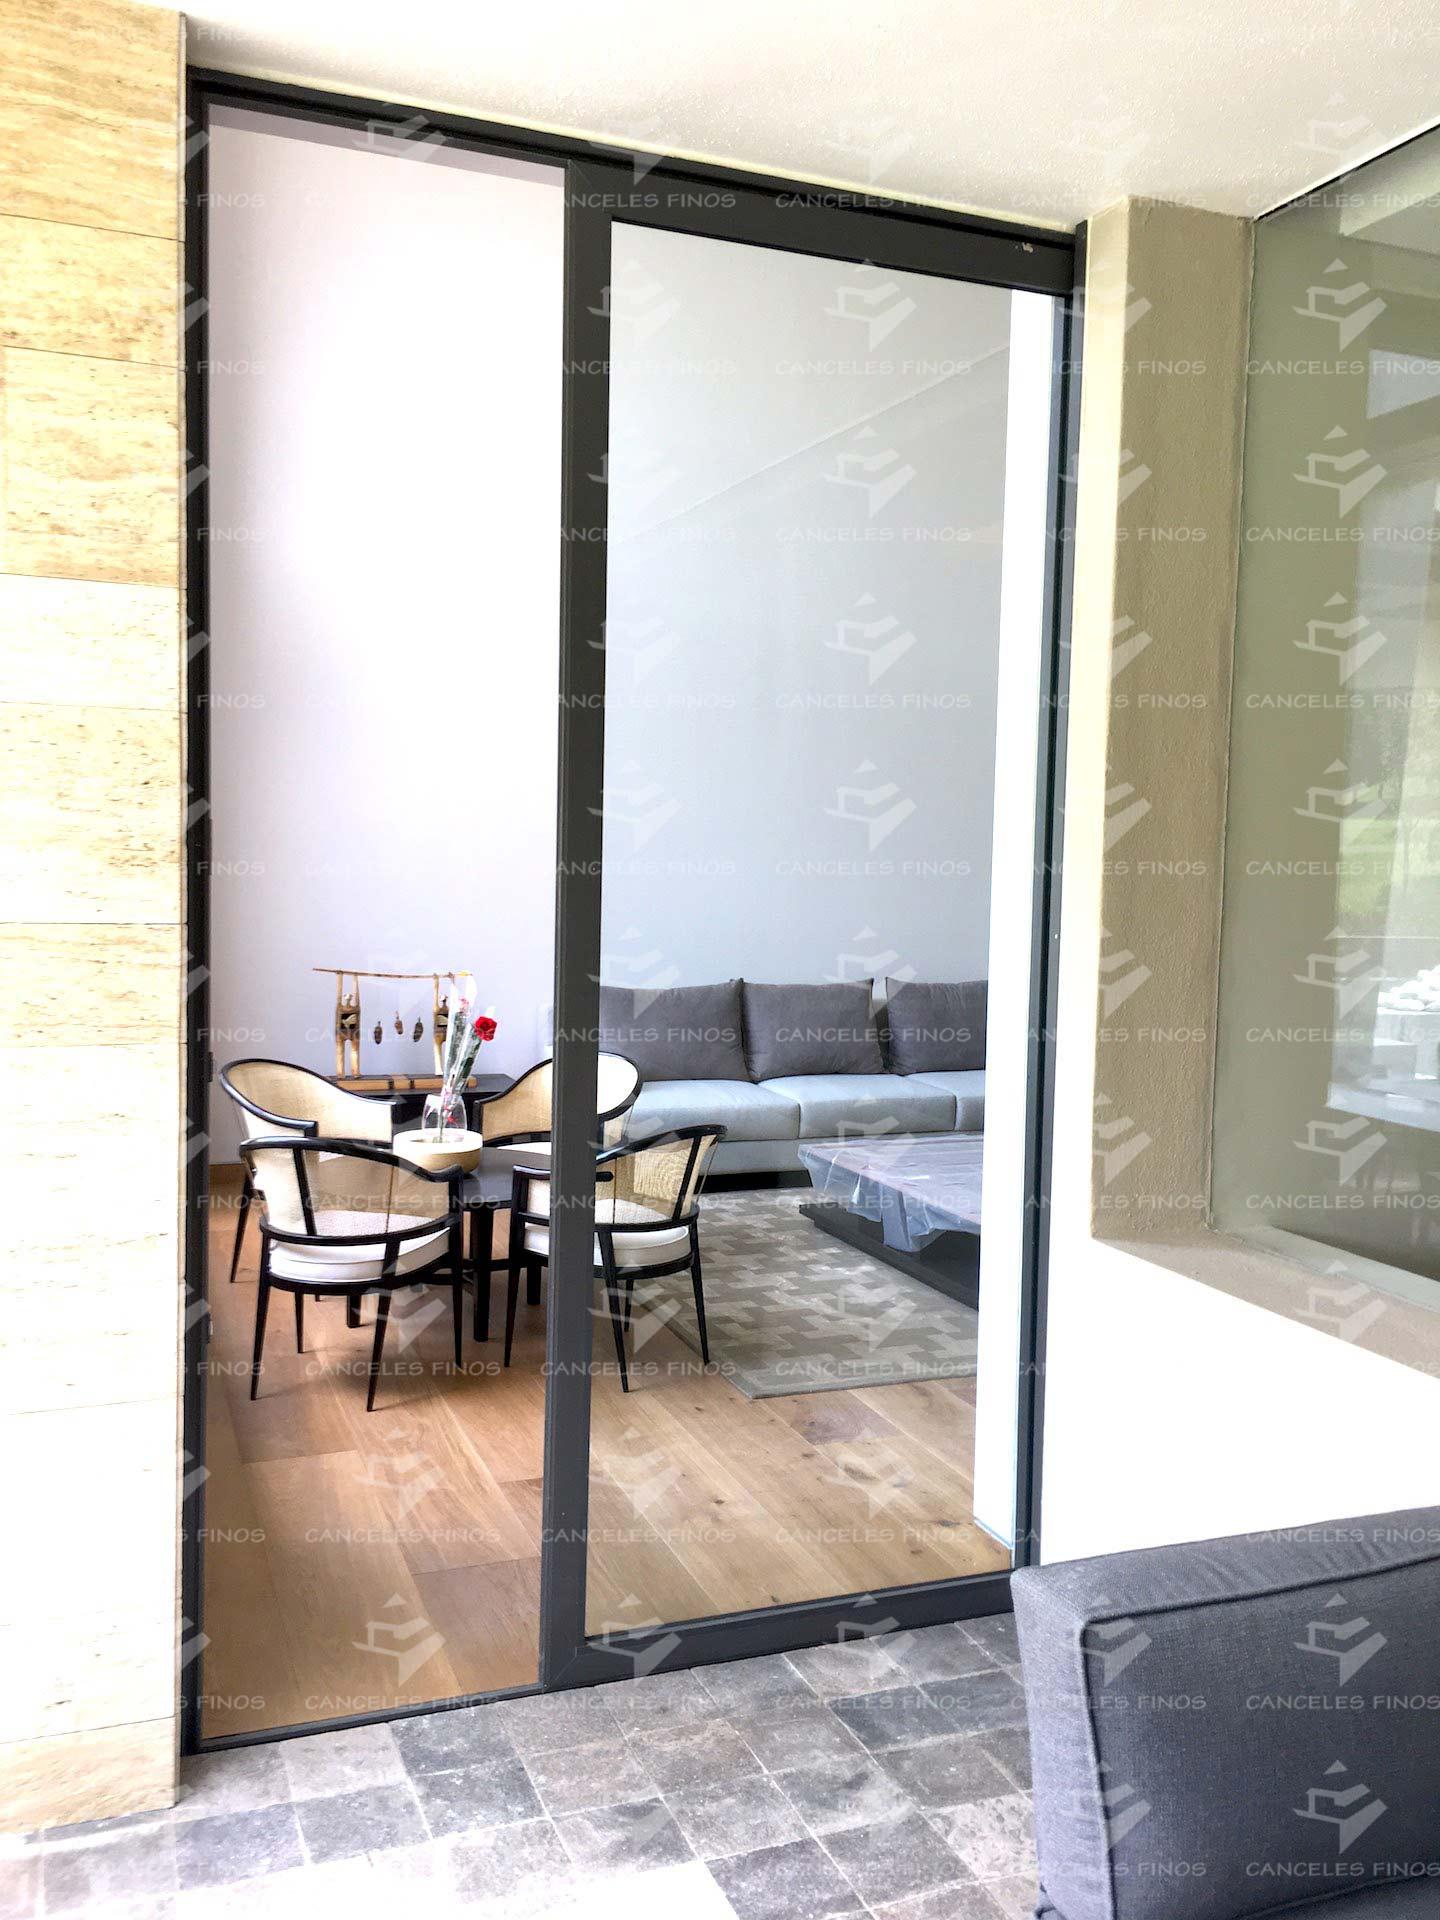 Puertas de cristal templado canceles finos for Puertas de cristal templado